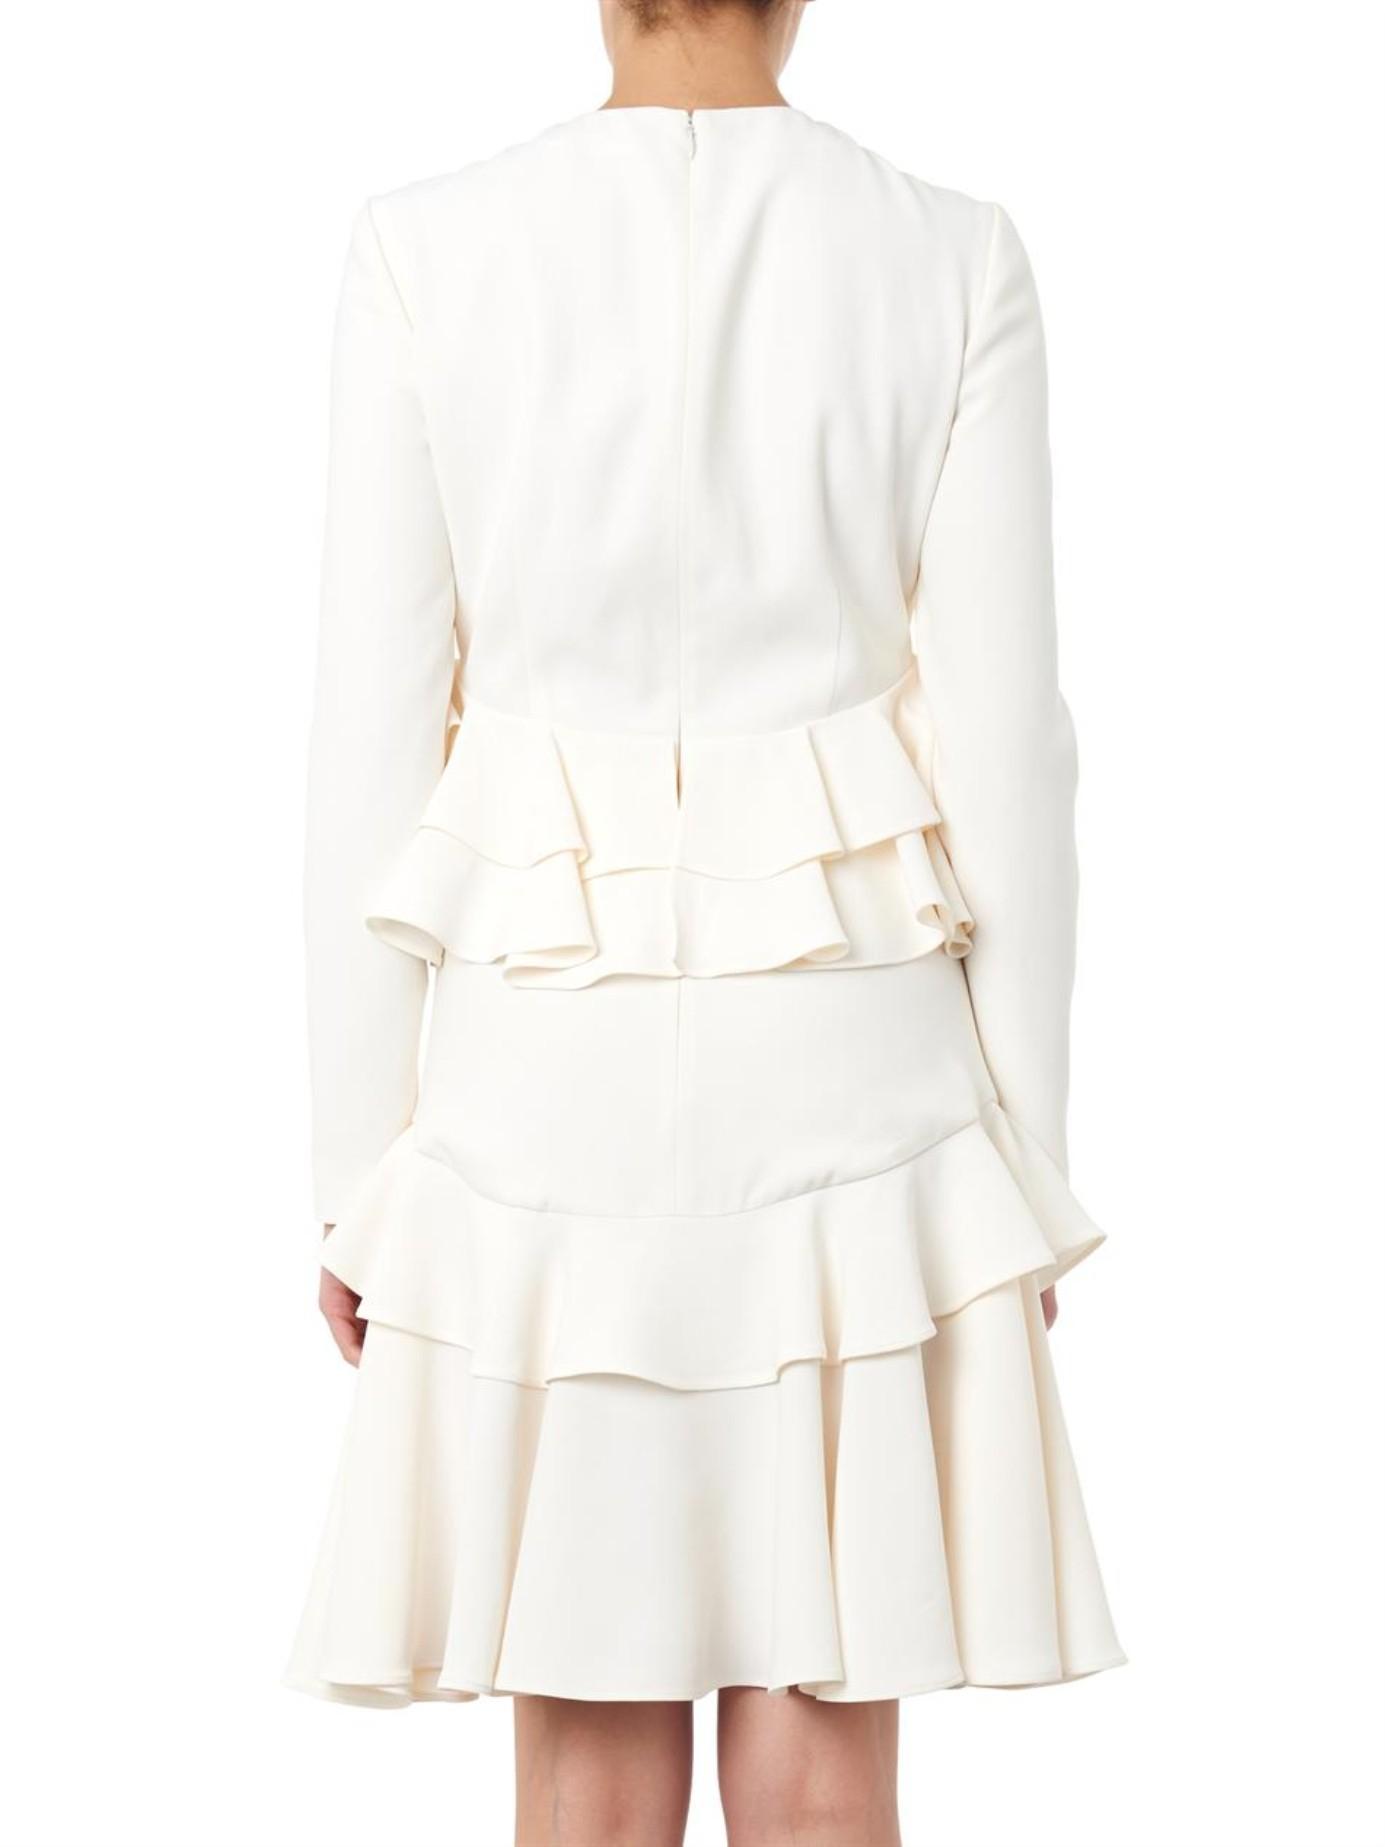 asymmetric ruffled dress - White Alexander McQueen Popular And Cheap sWcCsfj8f